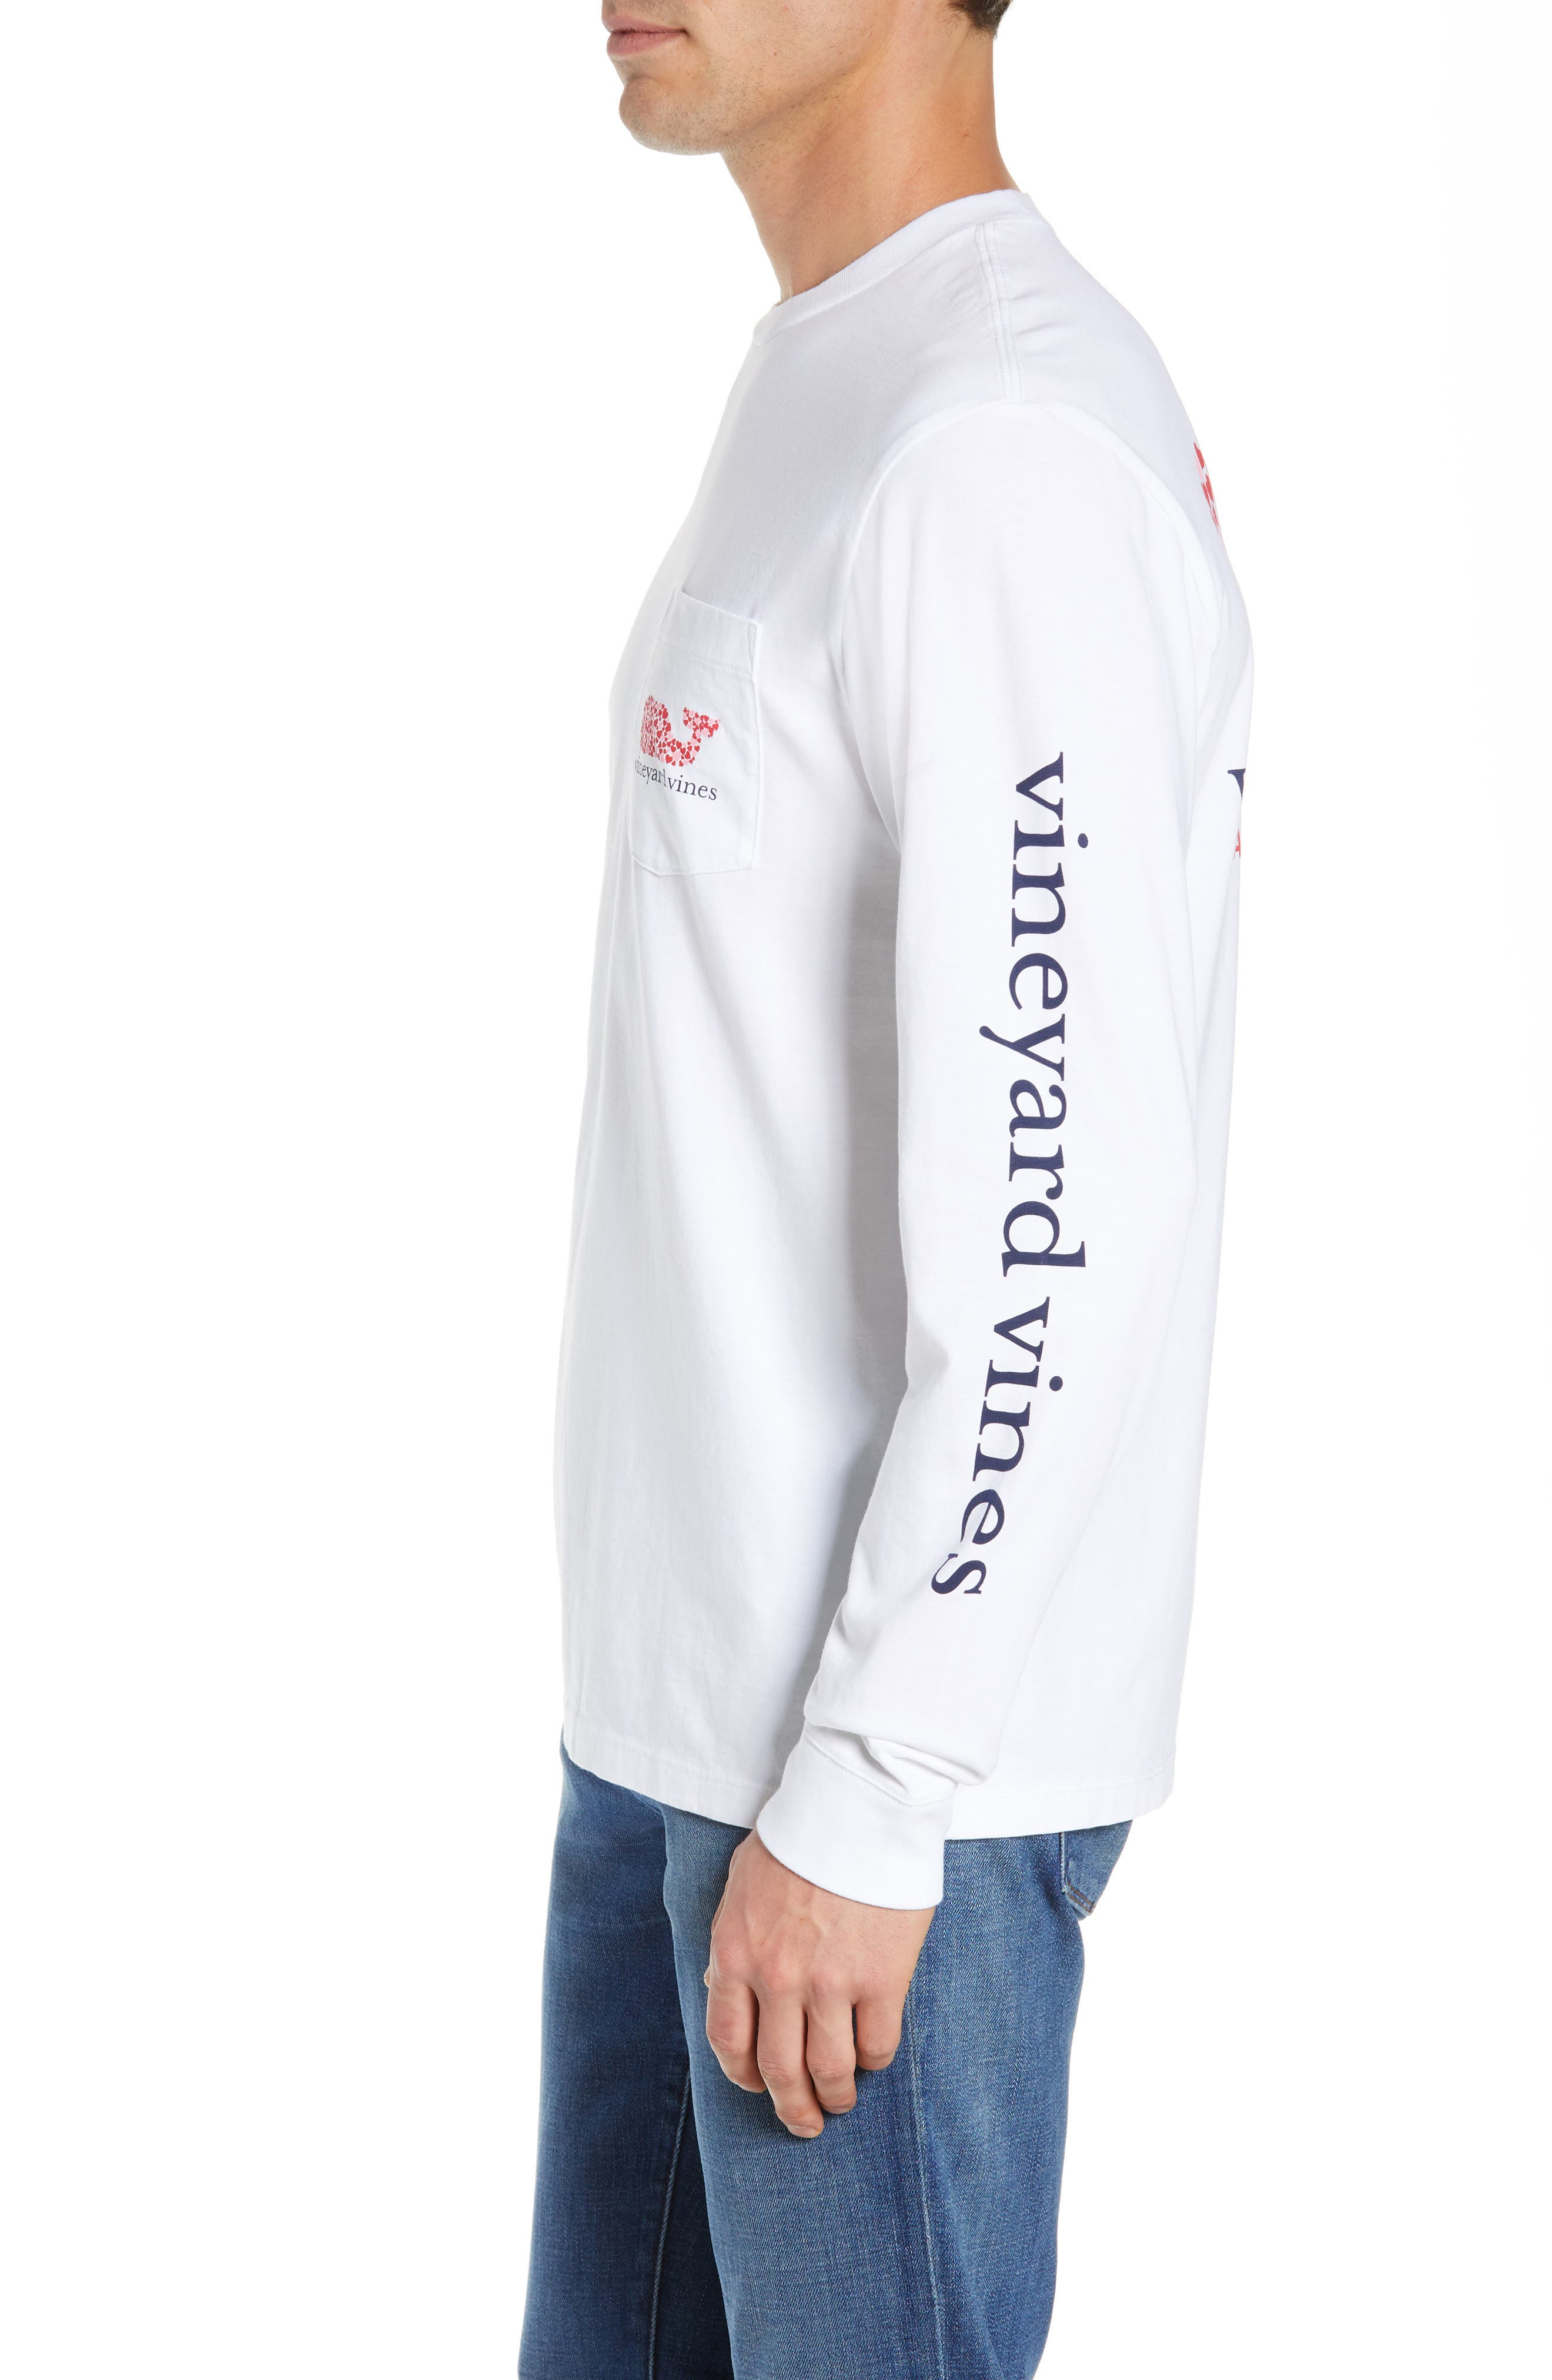 VINEYARD VINES,                             Valentine's Day Pocket T-Shirt,                             Alternate thumbnail 3, color,                             WHITE CAP